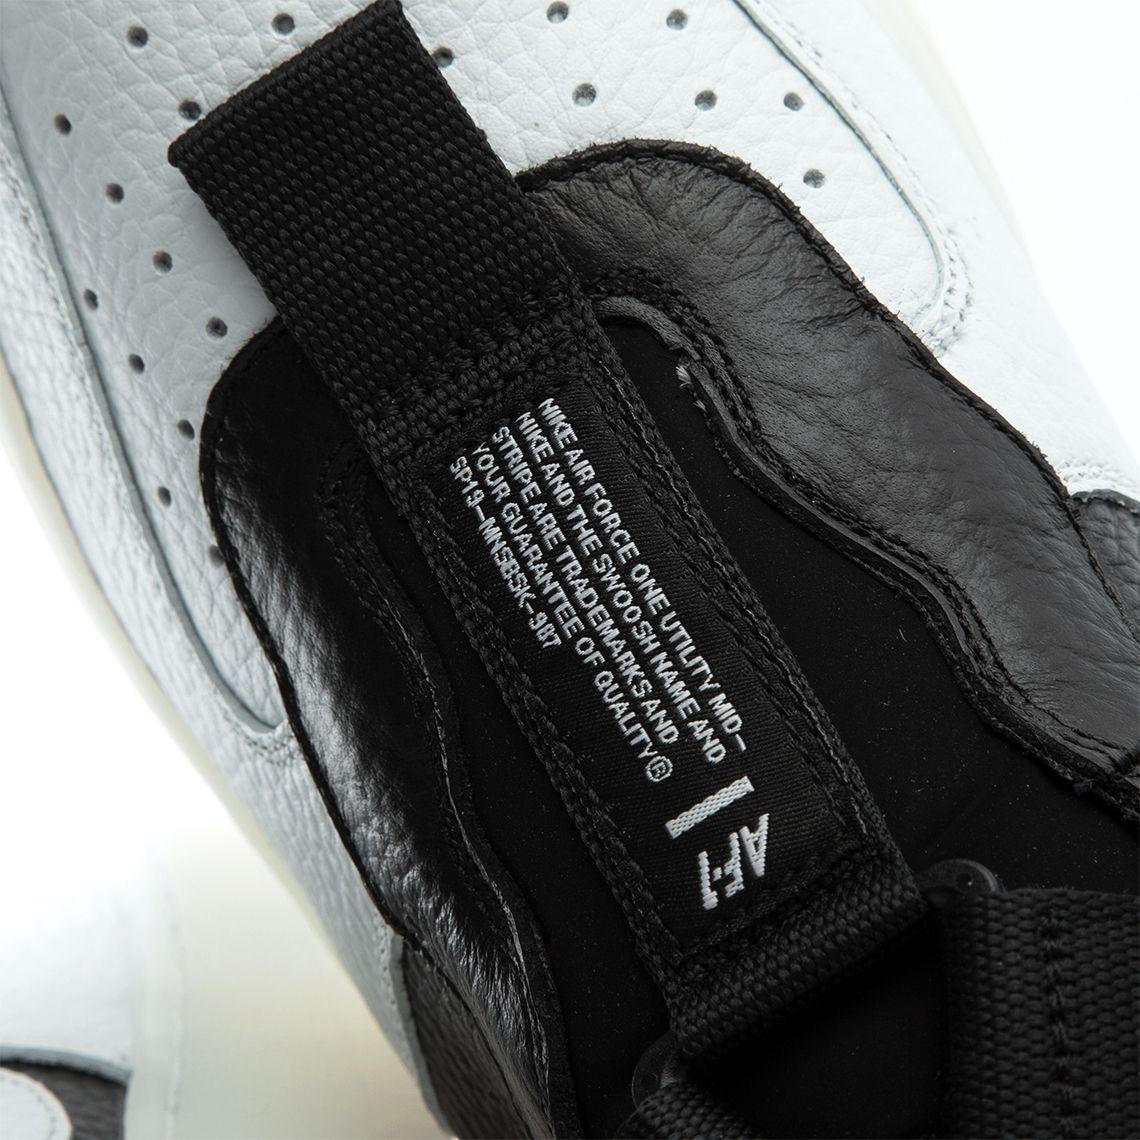 cheaper edb31 8b2c1 Sneaker News on Twitter